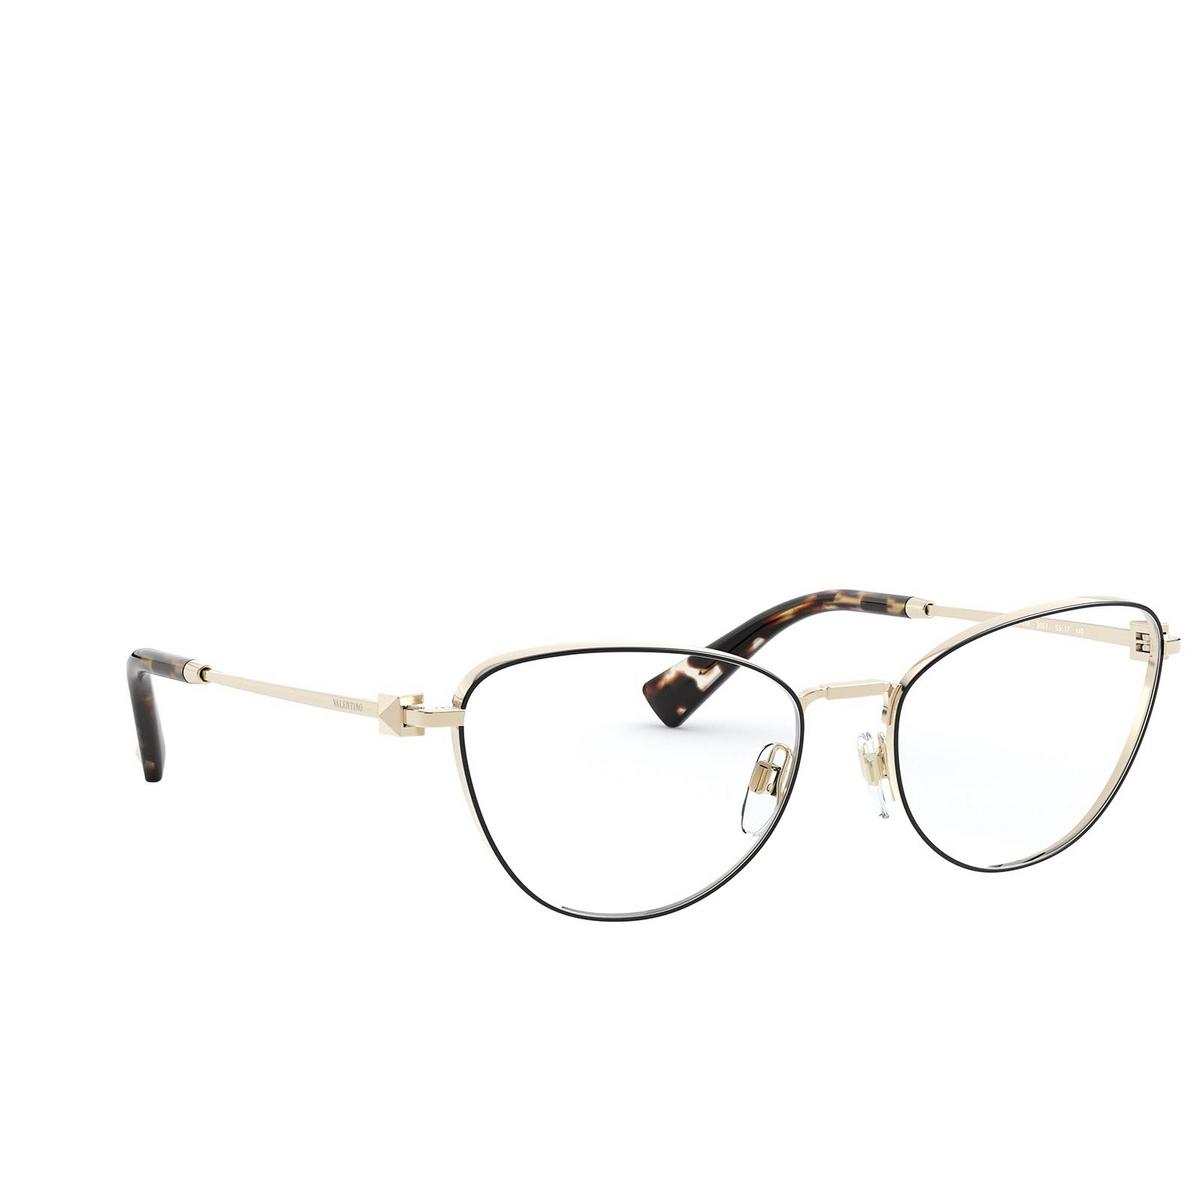 Valentino® Cat-eye Eyeglasses: VA1016 color Pale Gold / Black 3053 - three-quarters view.